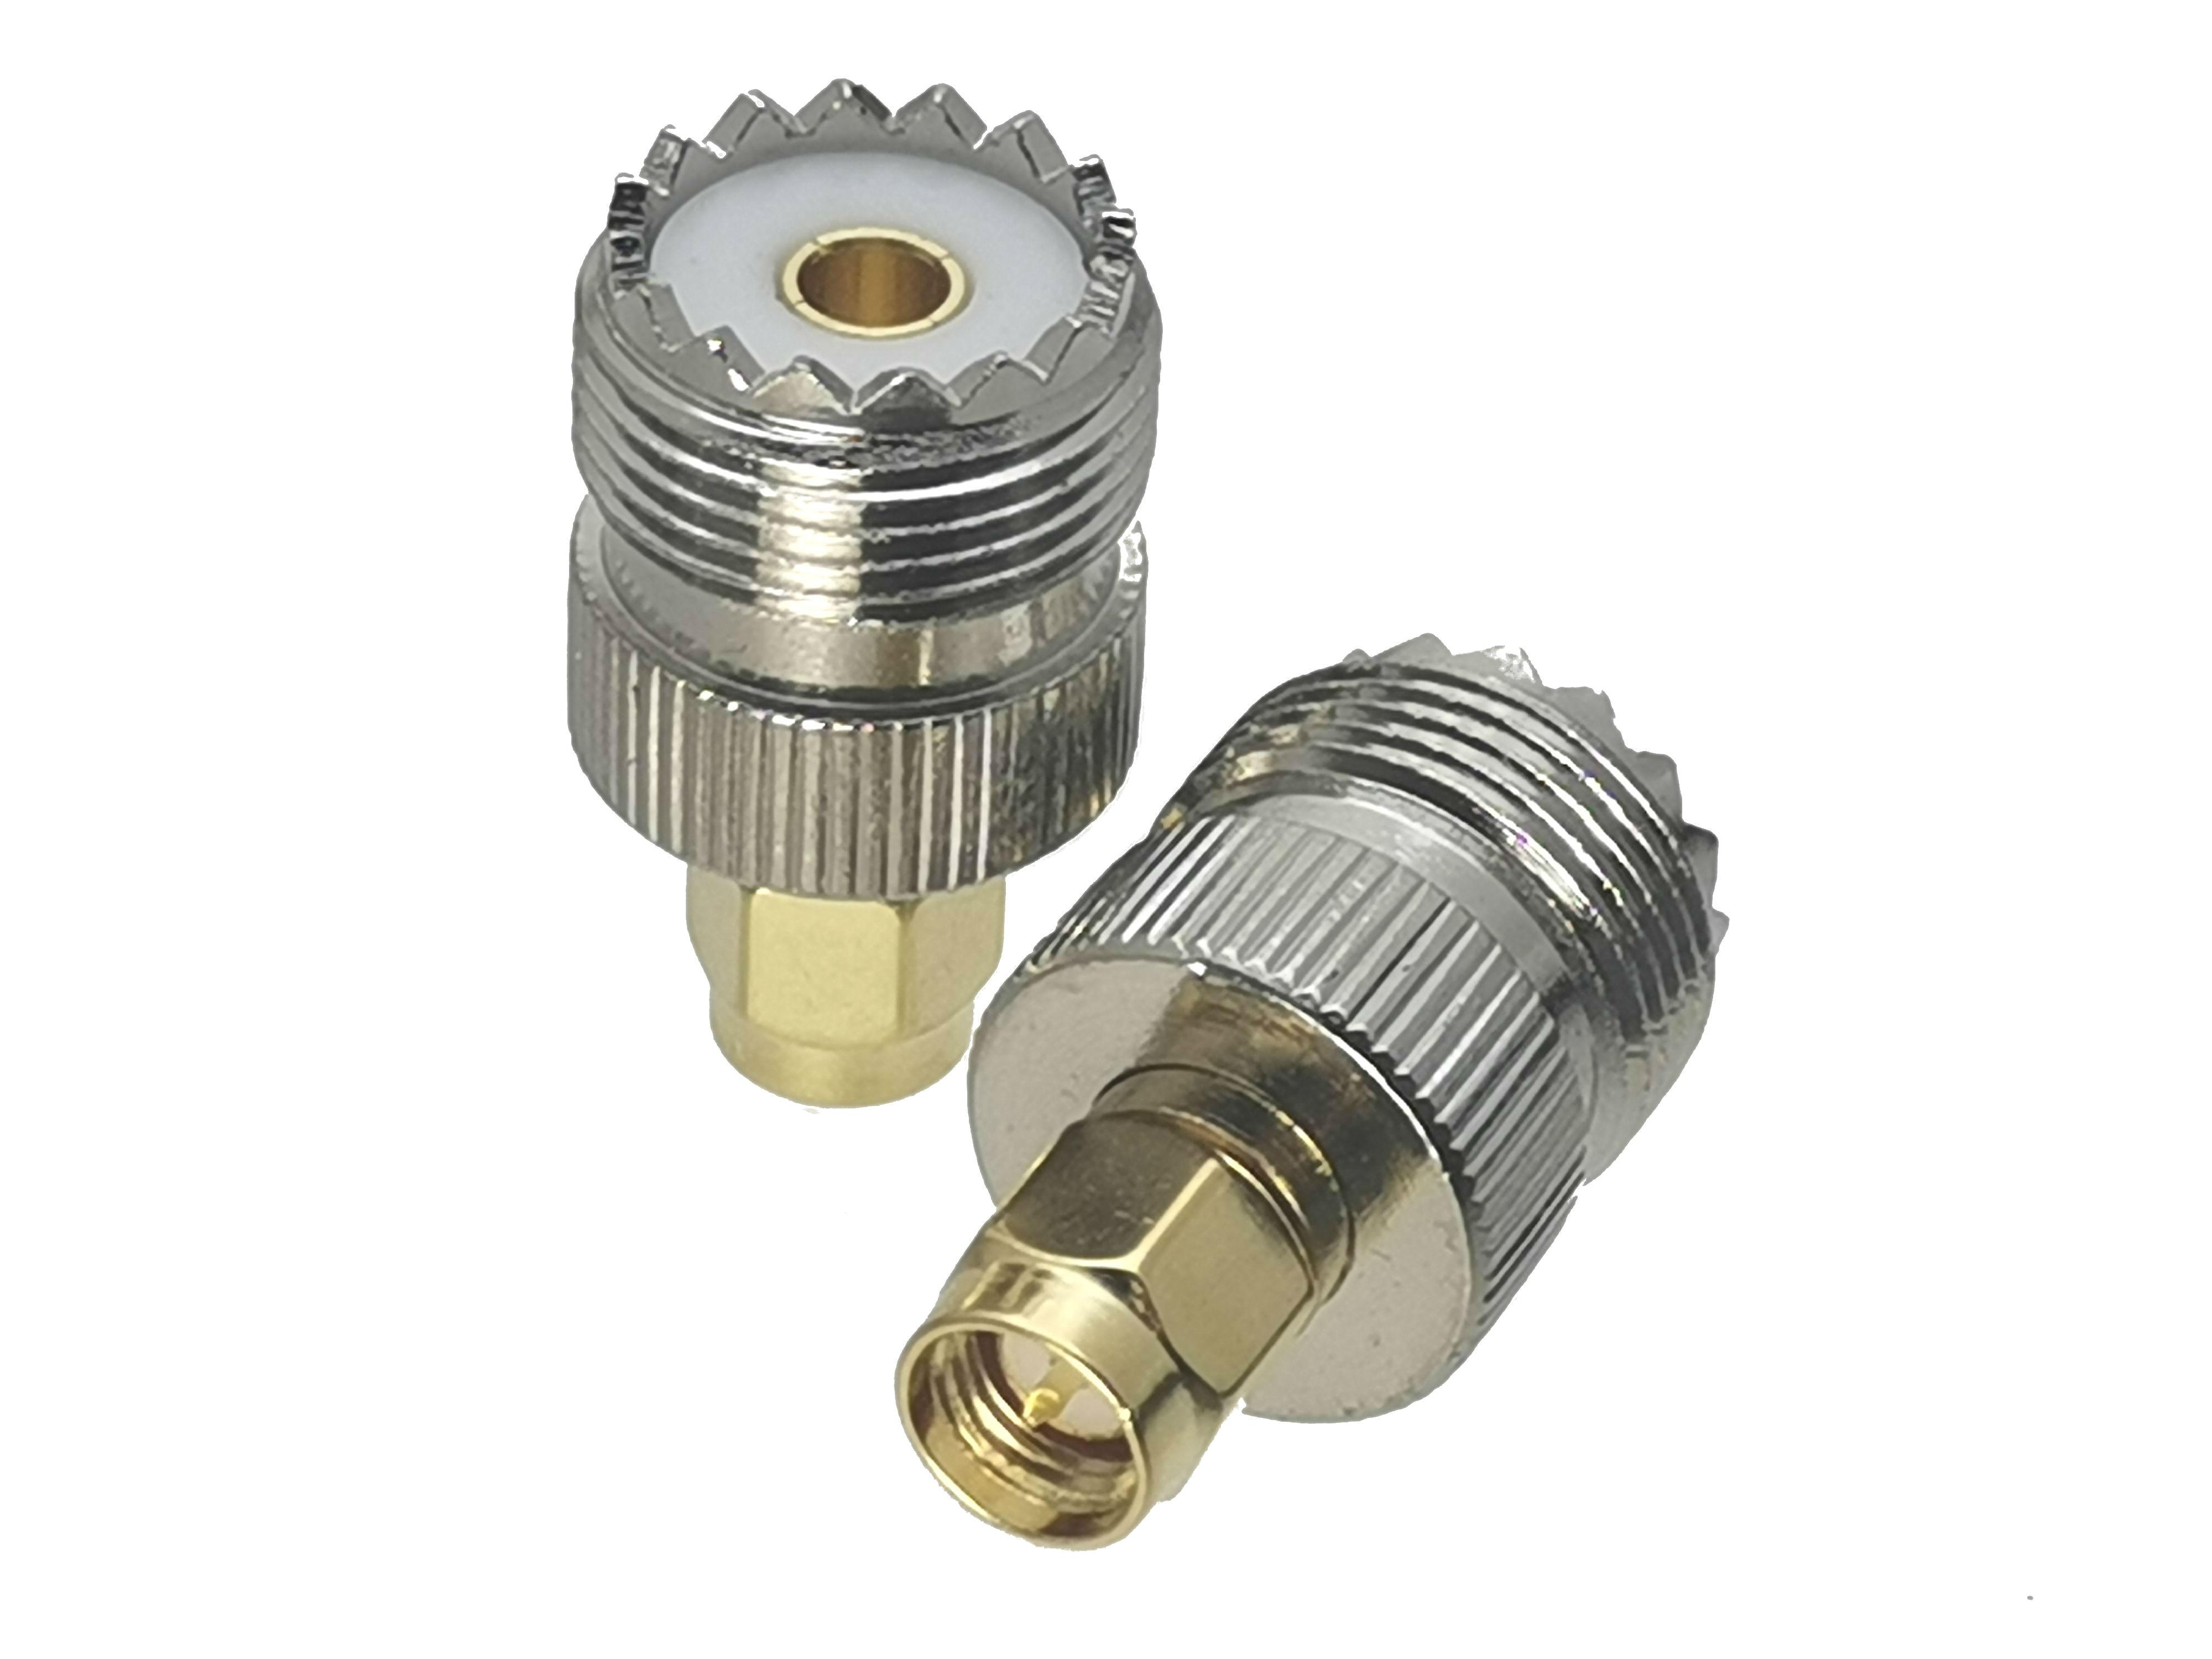 1Pcs UHF Female SO-239 SO239 Jack To SMA Male Plug RF Coaxial Adapter Connector